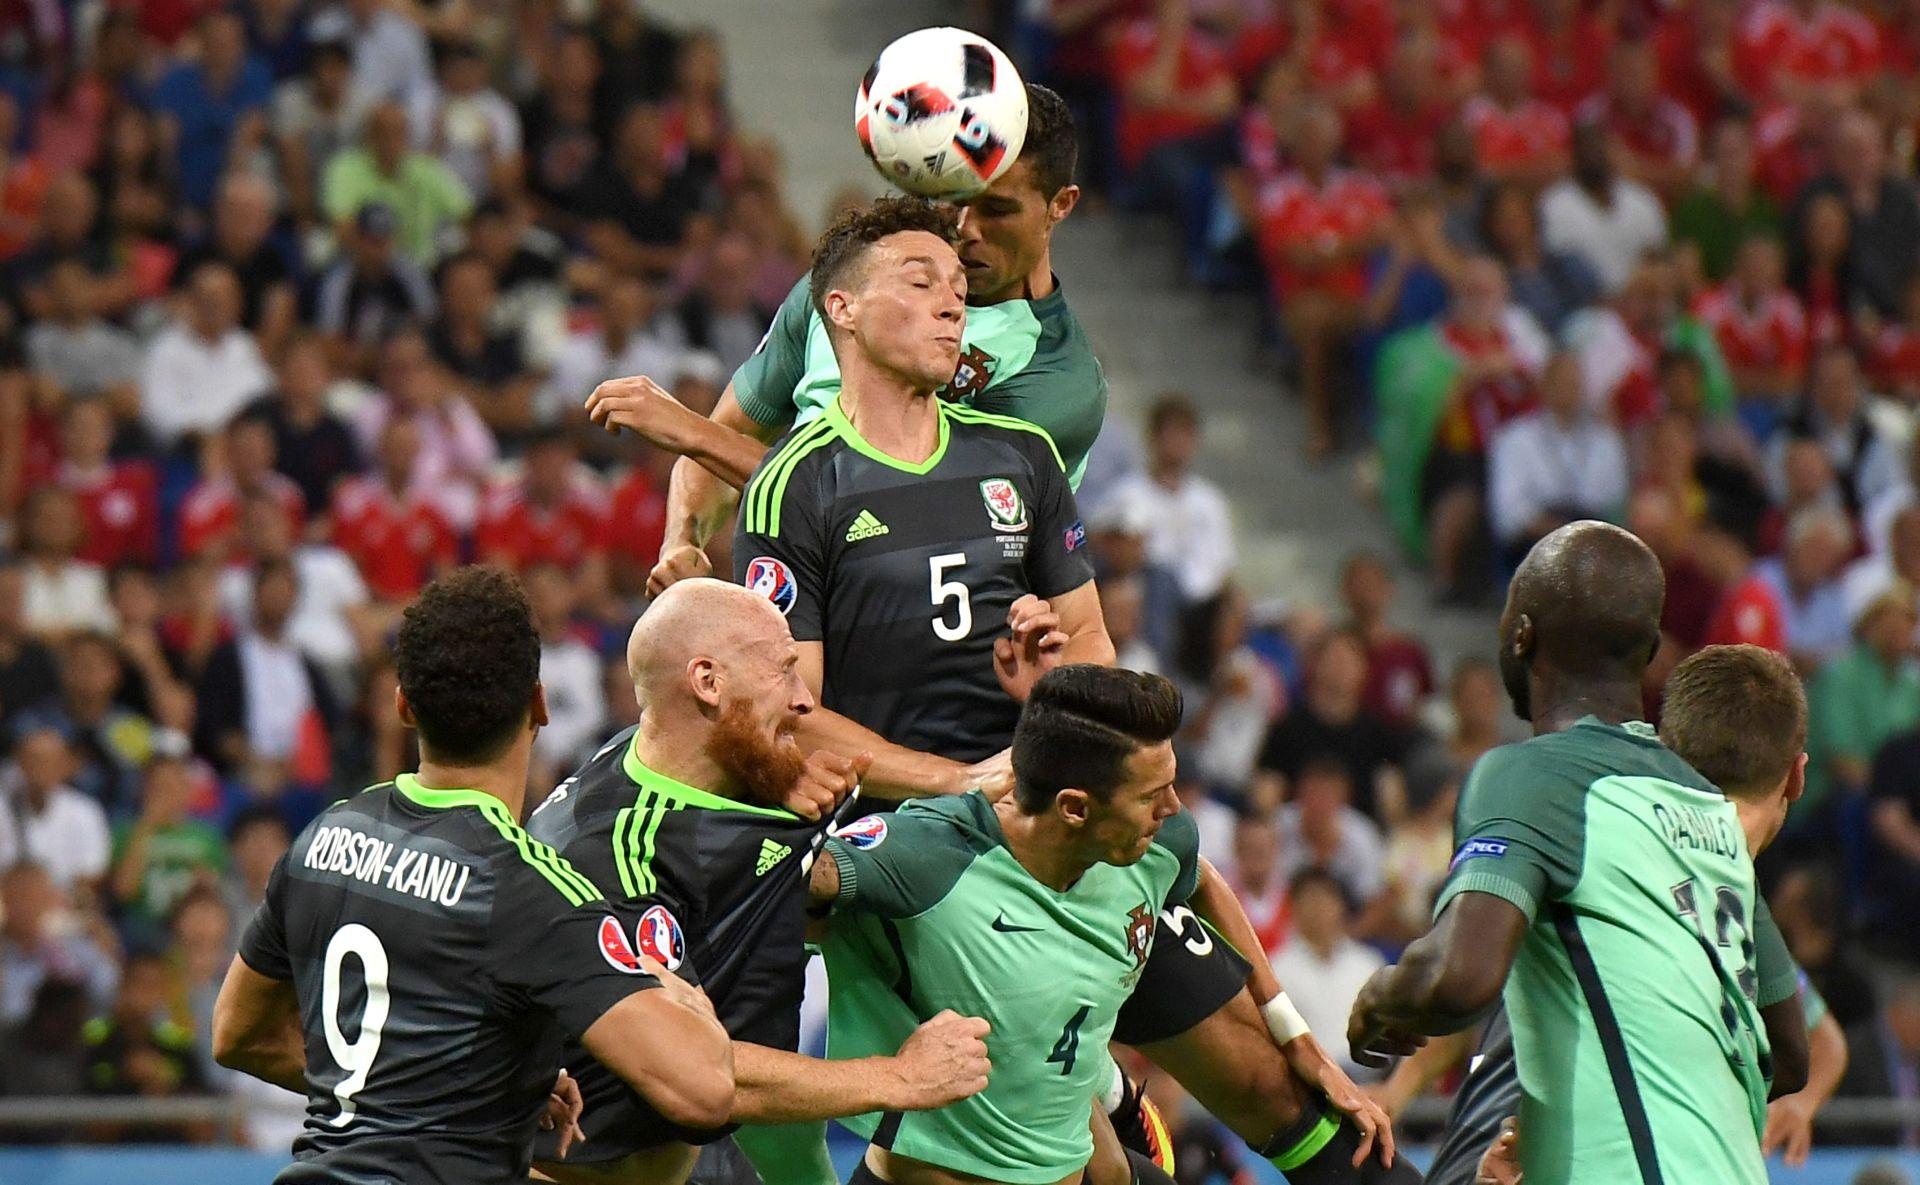 POLUFINALE EURA: Portugal izborio finale, Ronaldo dostigao Platinija